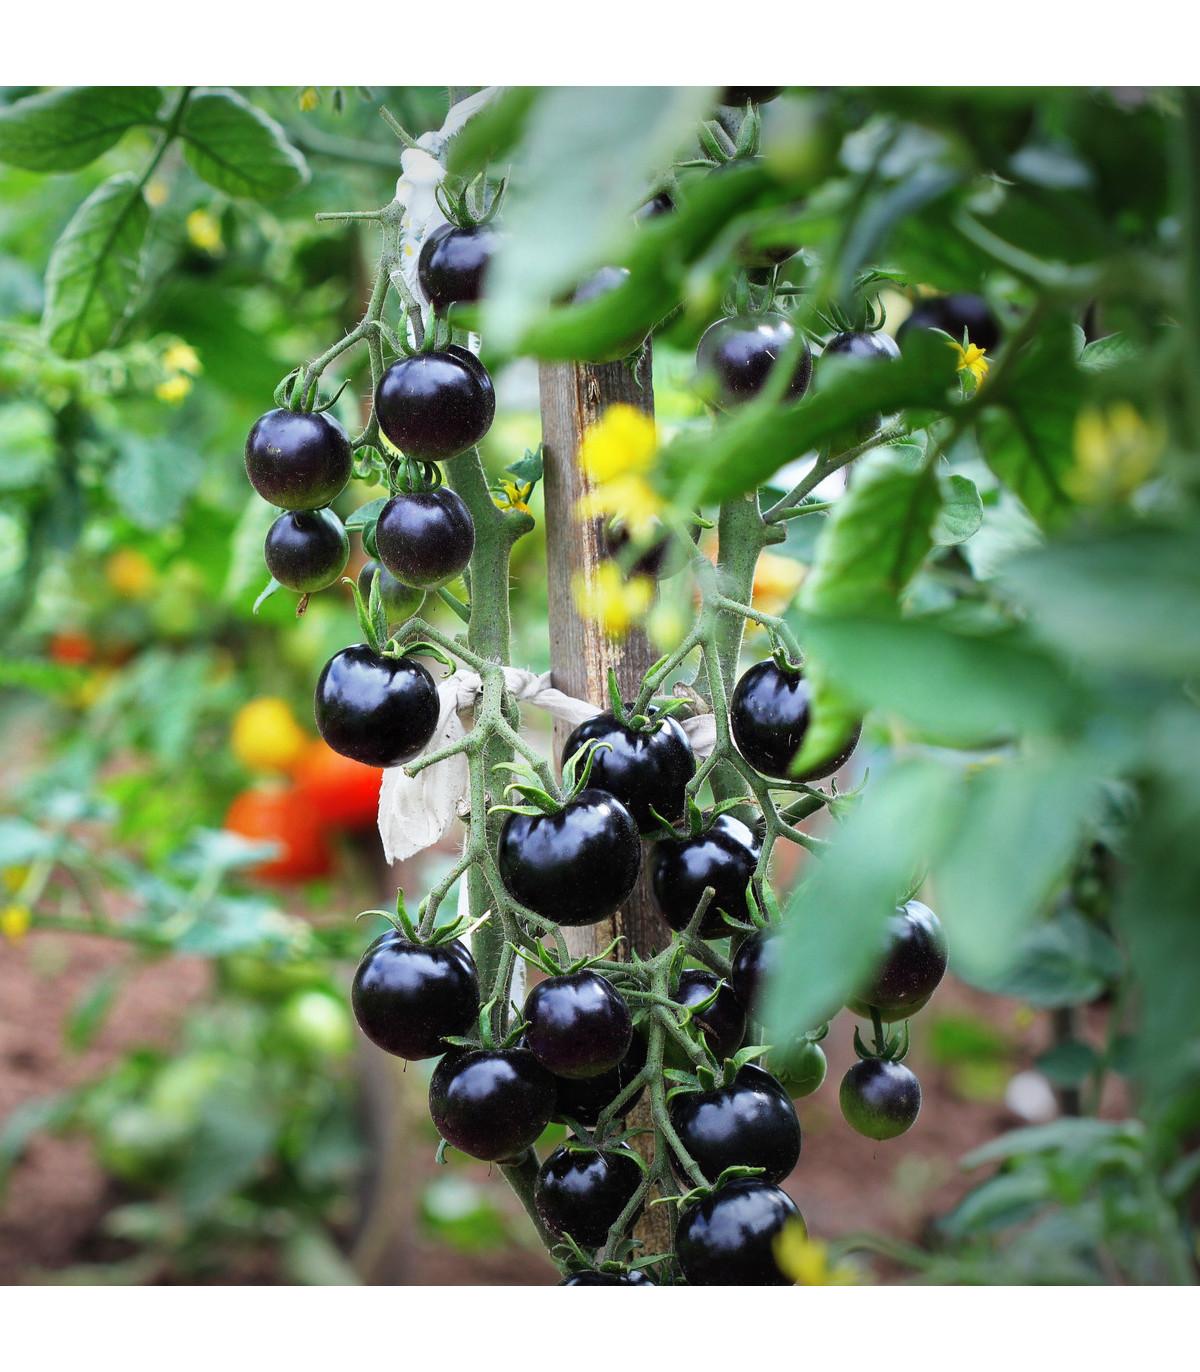 Paradajka Indigo Blue Berries - tyčková paradajka - Lycopersicon lycopersicum L. - predaj semien paradajok - 7 Ks